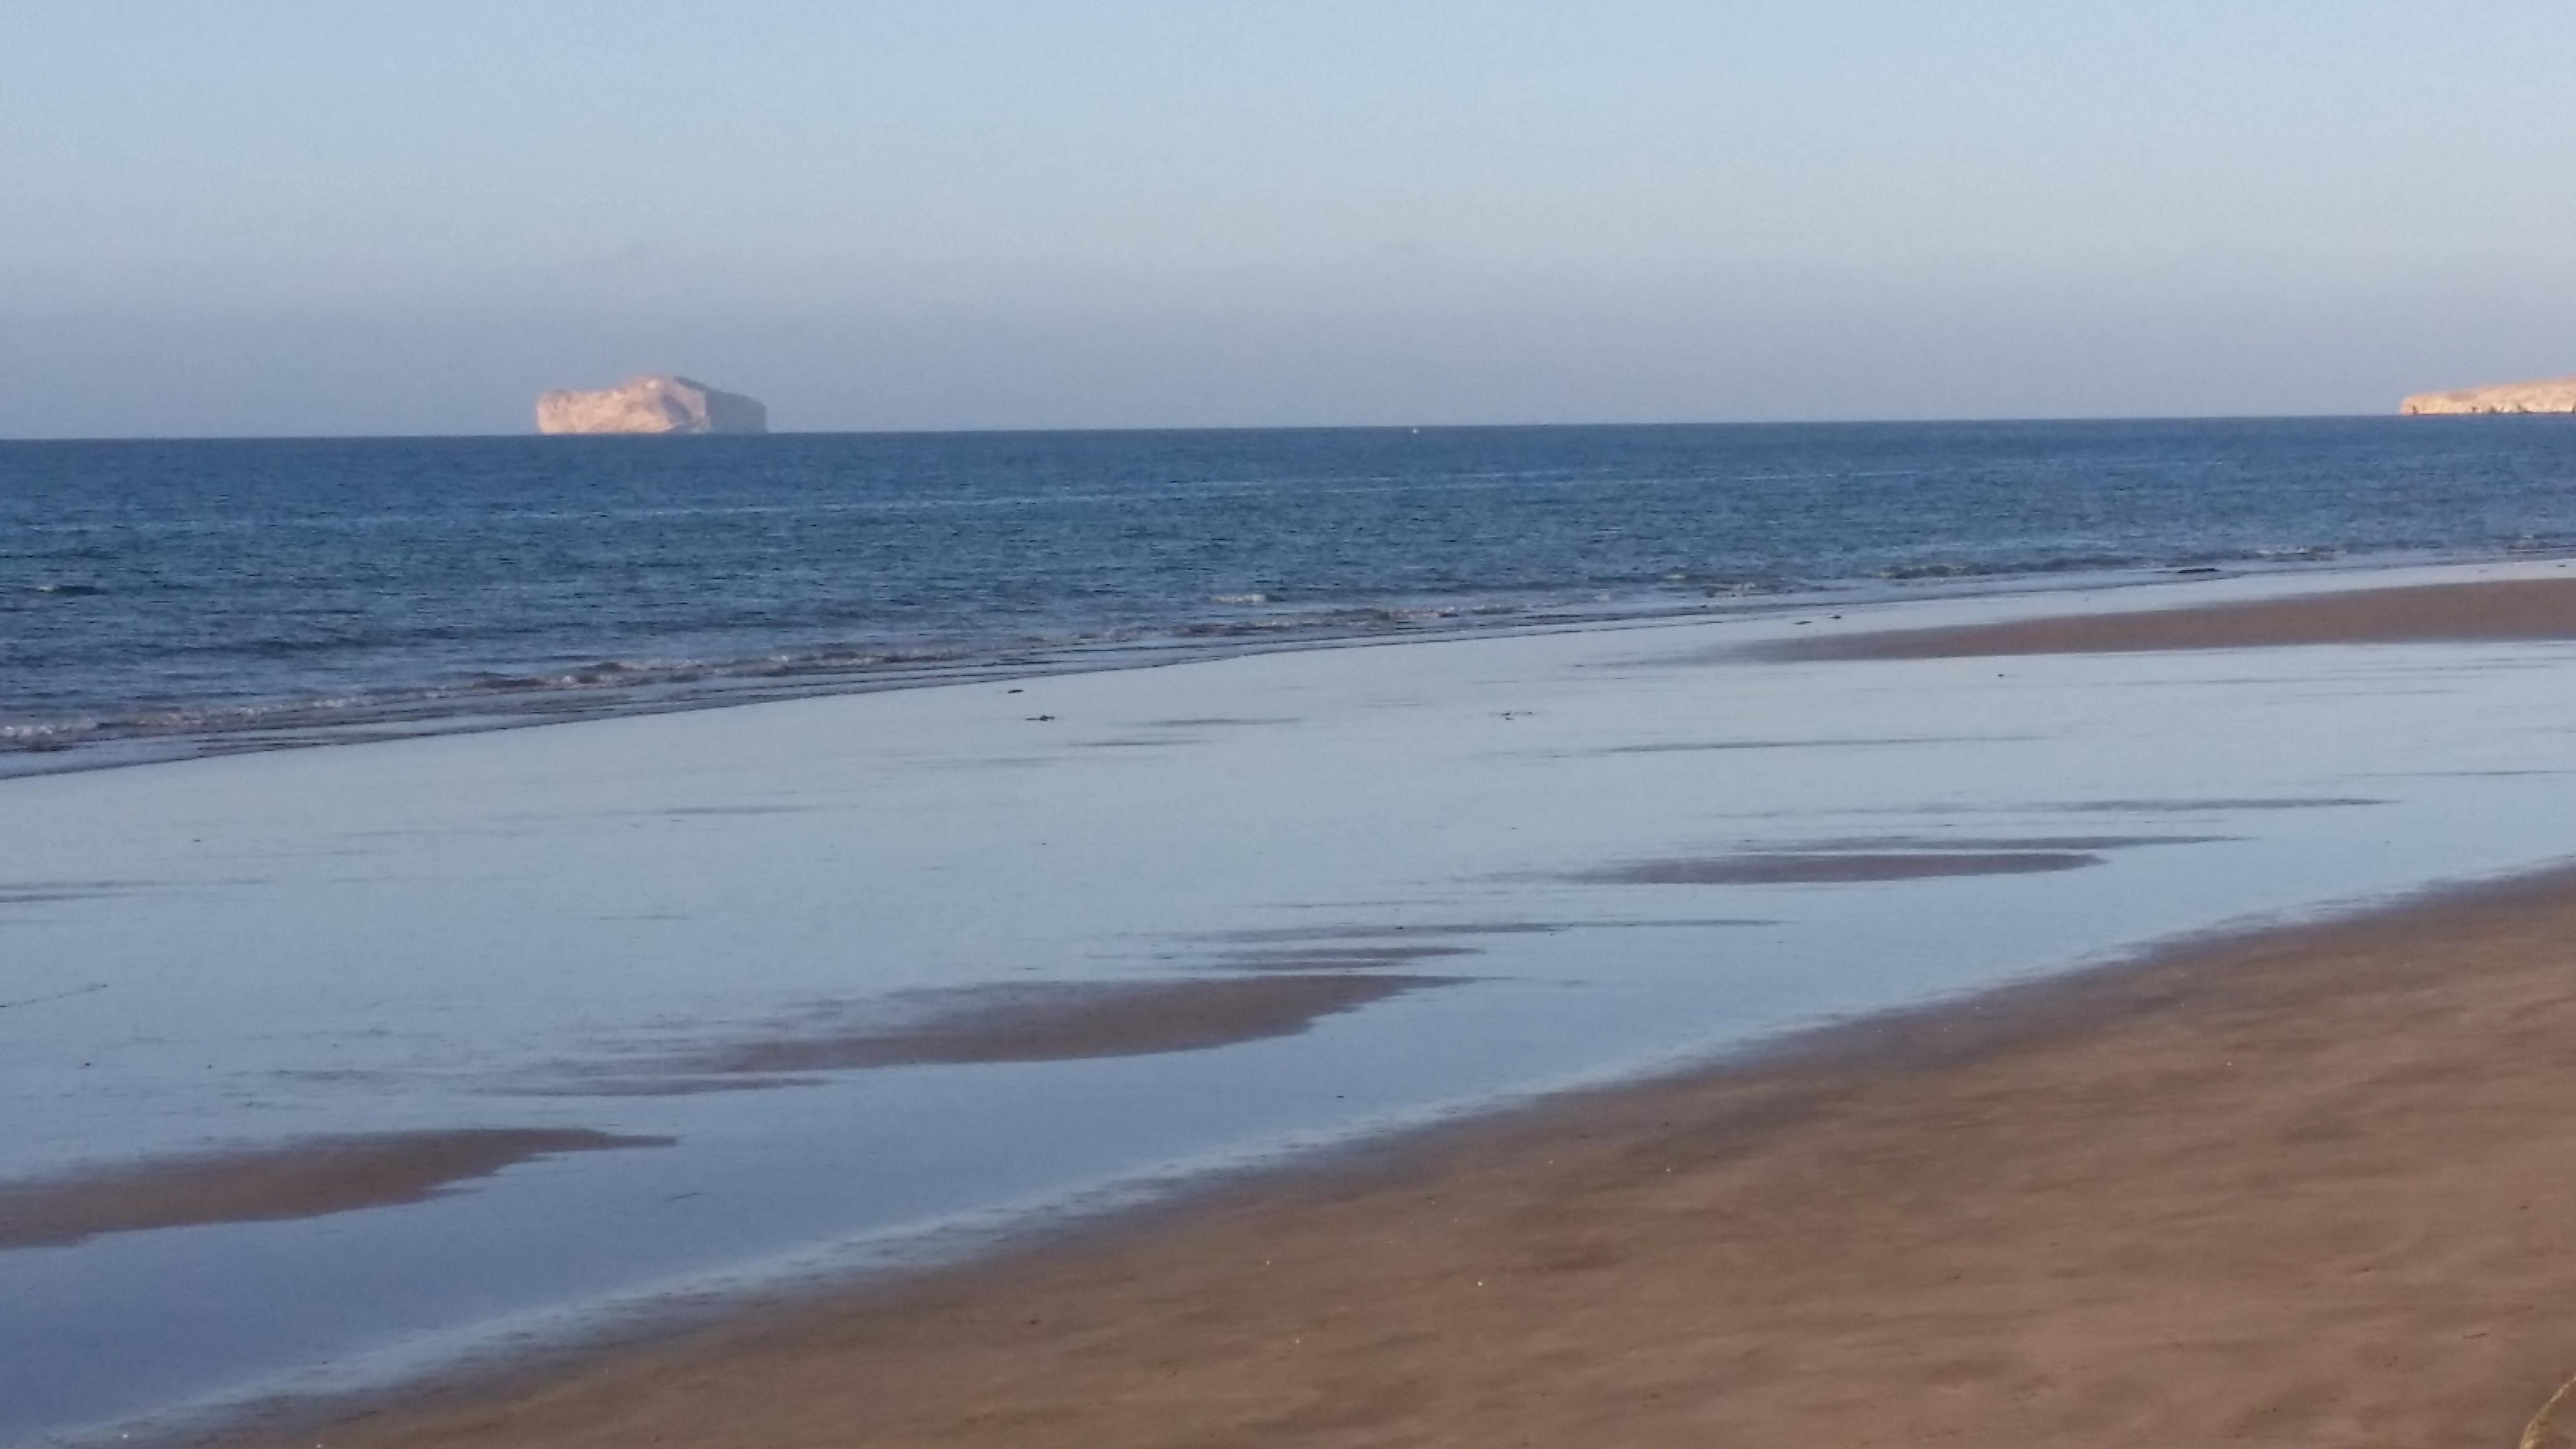 Tropical Island Beach Ambience Sound: شاطئ العذيبه زين تغير جو ع بحر